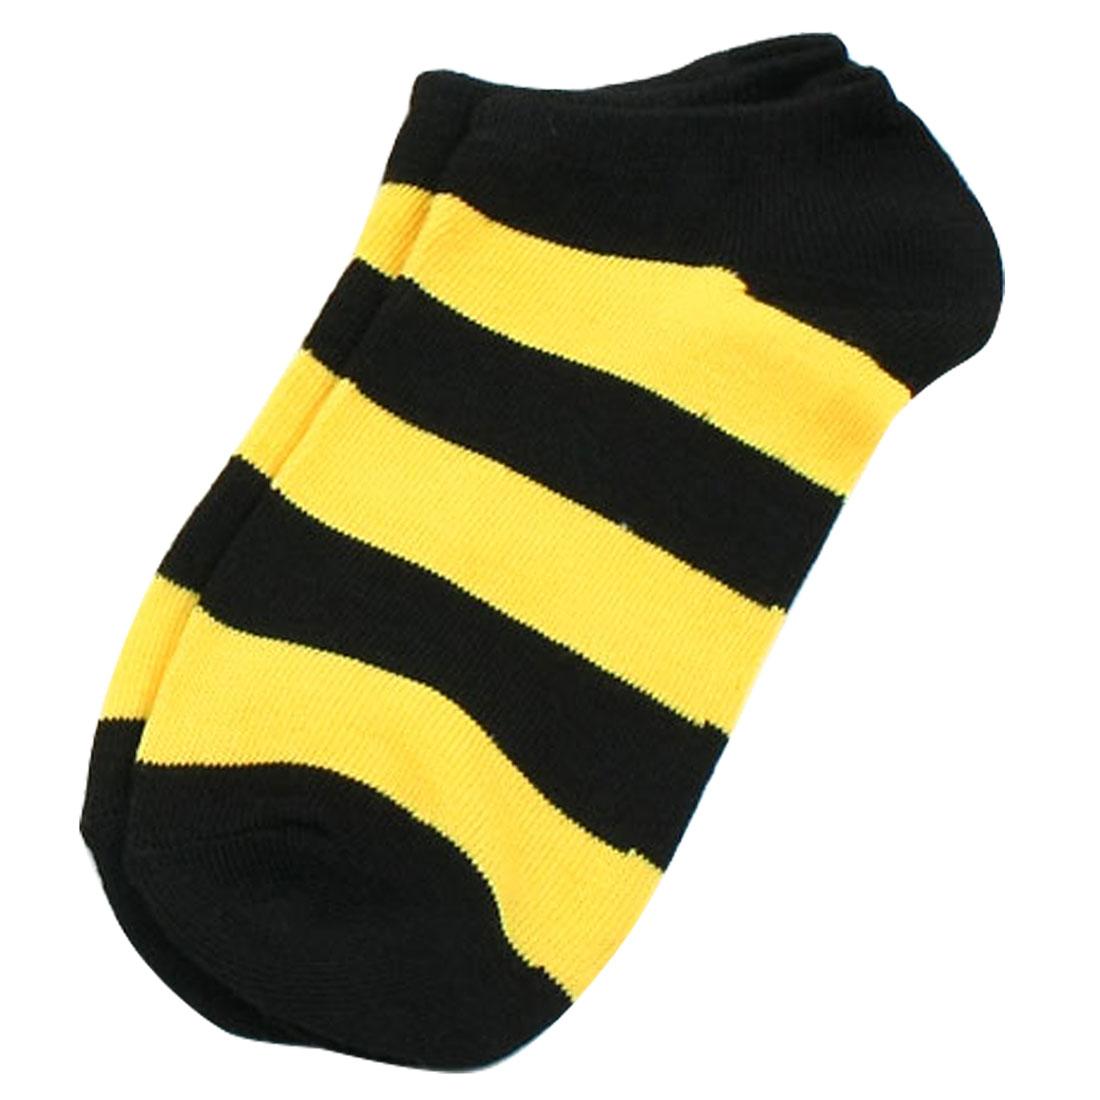 10 Pairs Leisure Stripe Printed Elastic Low Cut Socks Yellow Black for Girls